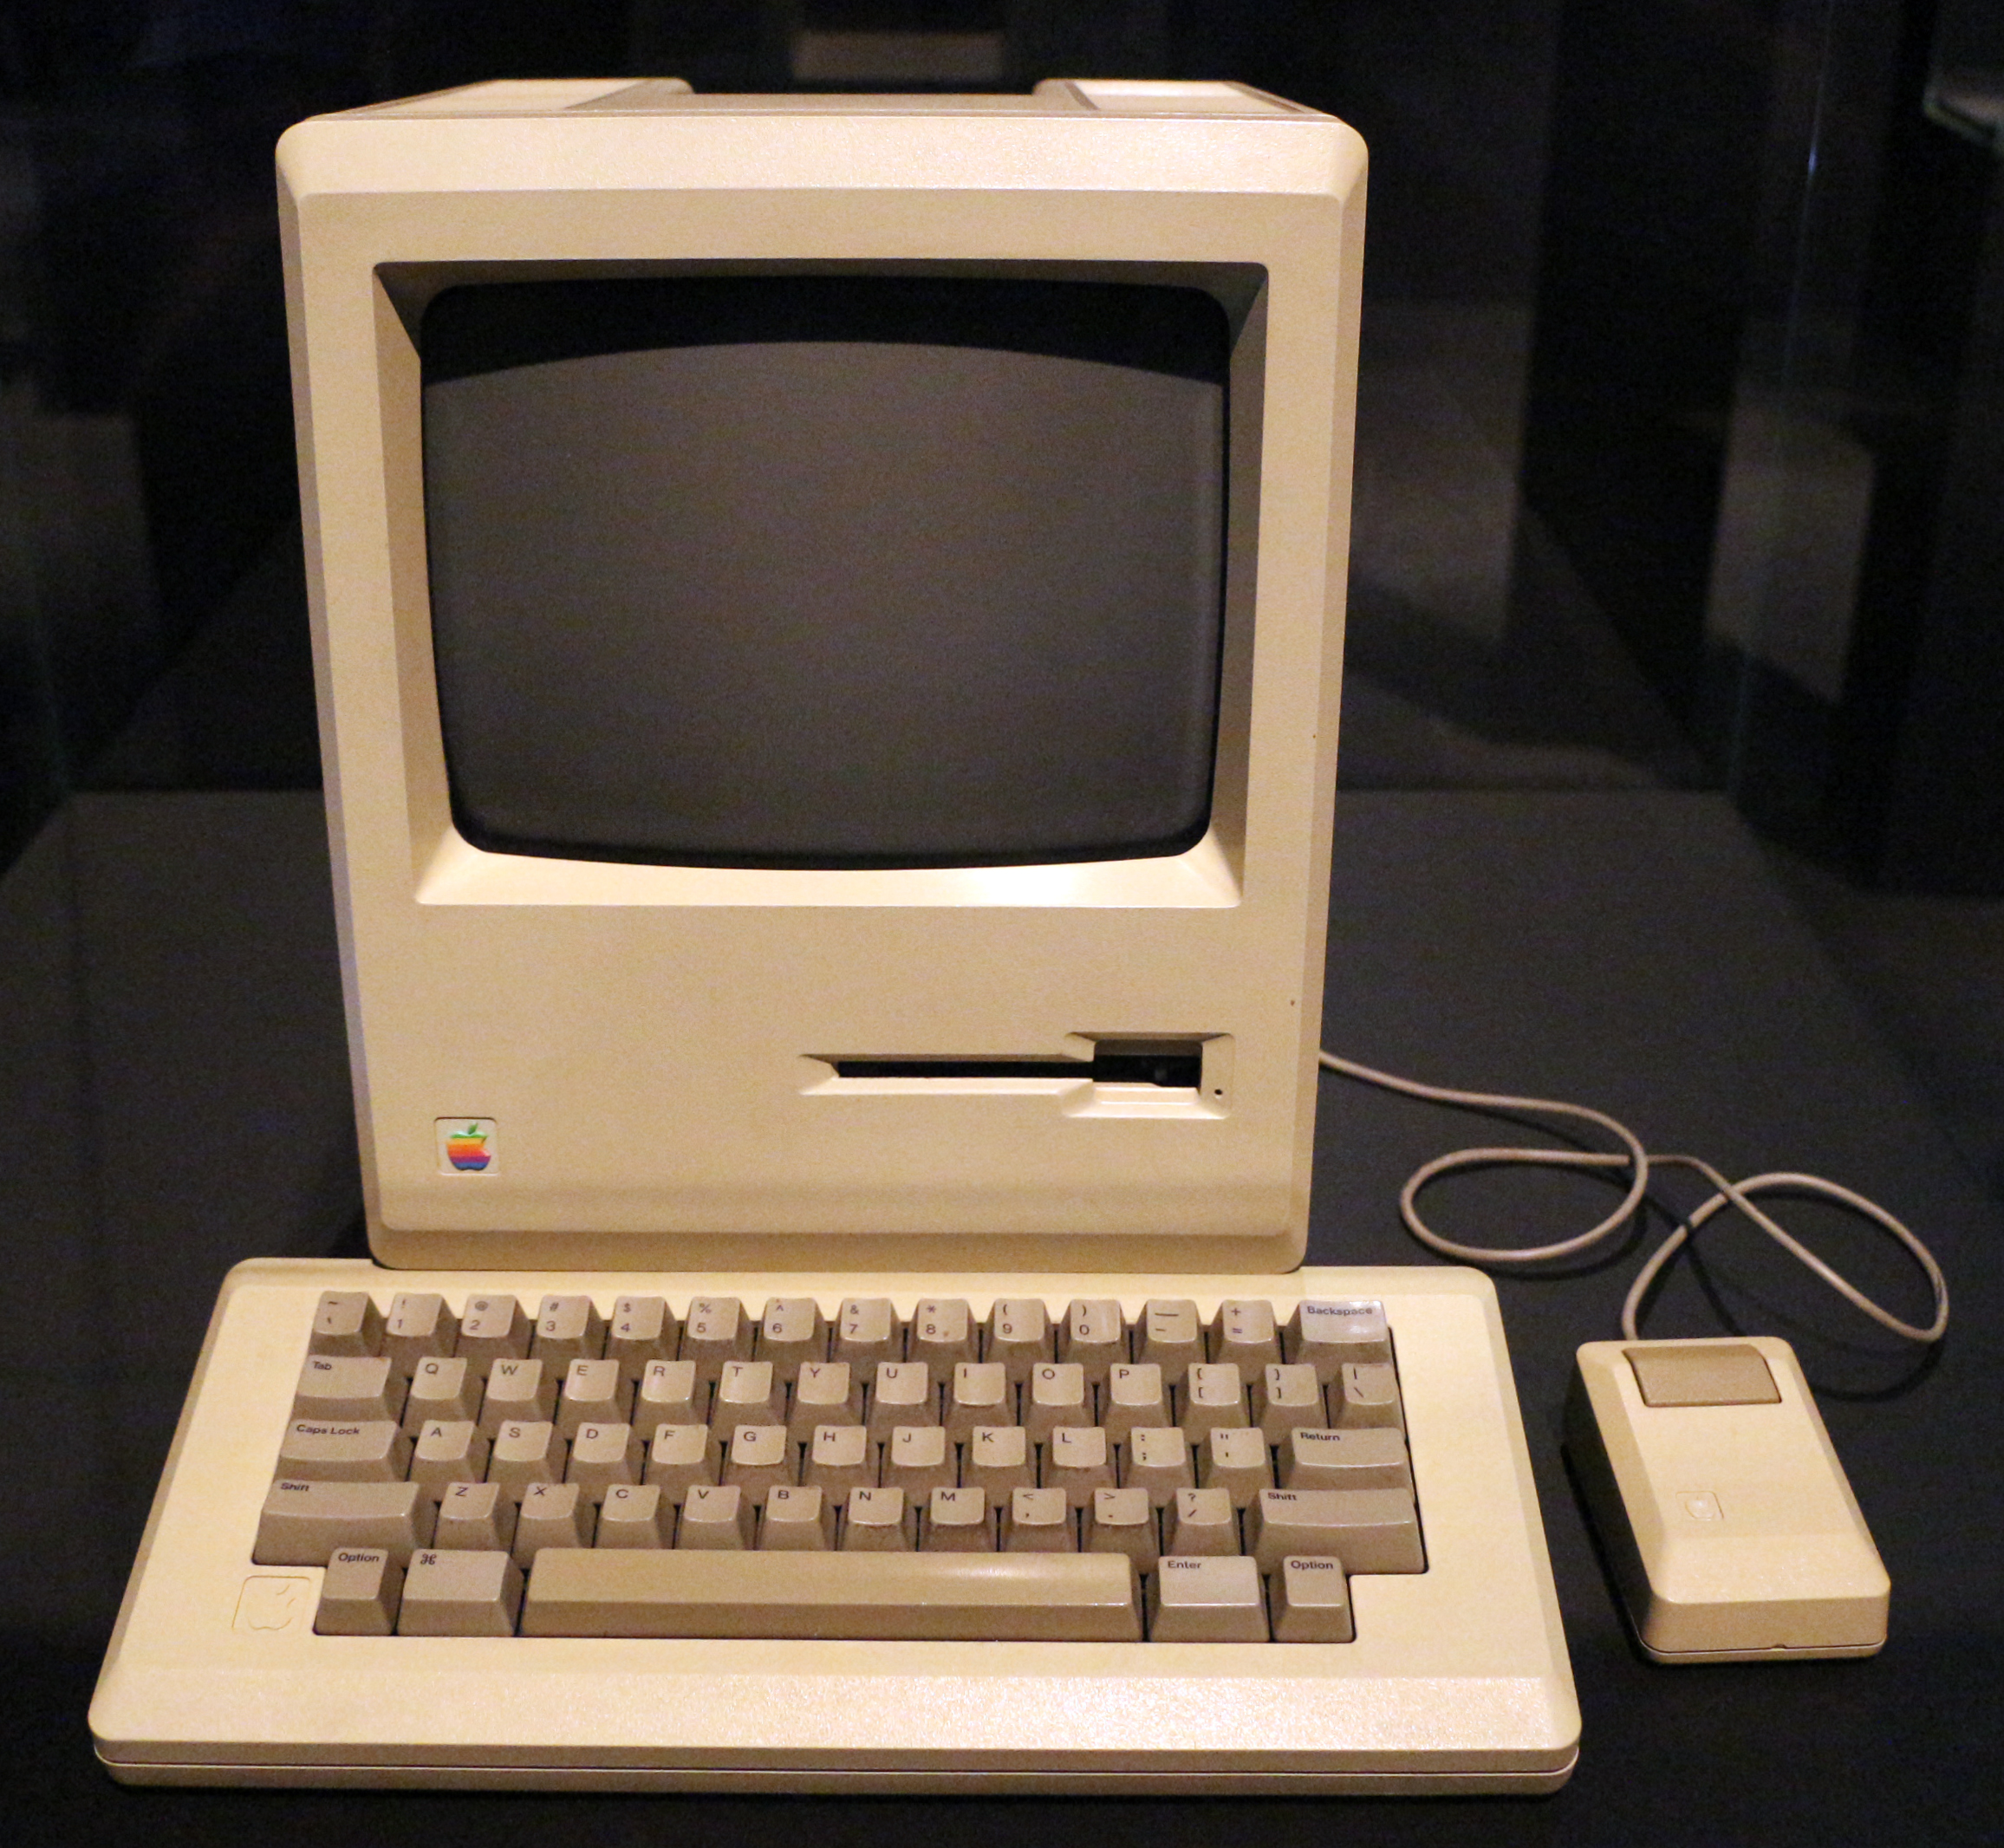 Computer macintosh 128k%2C 1984 (all about Apple onlus)